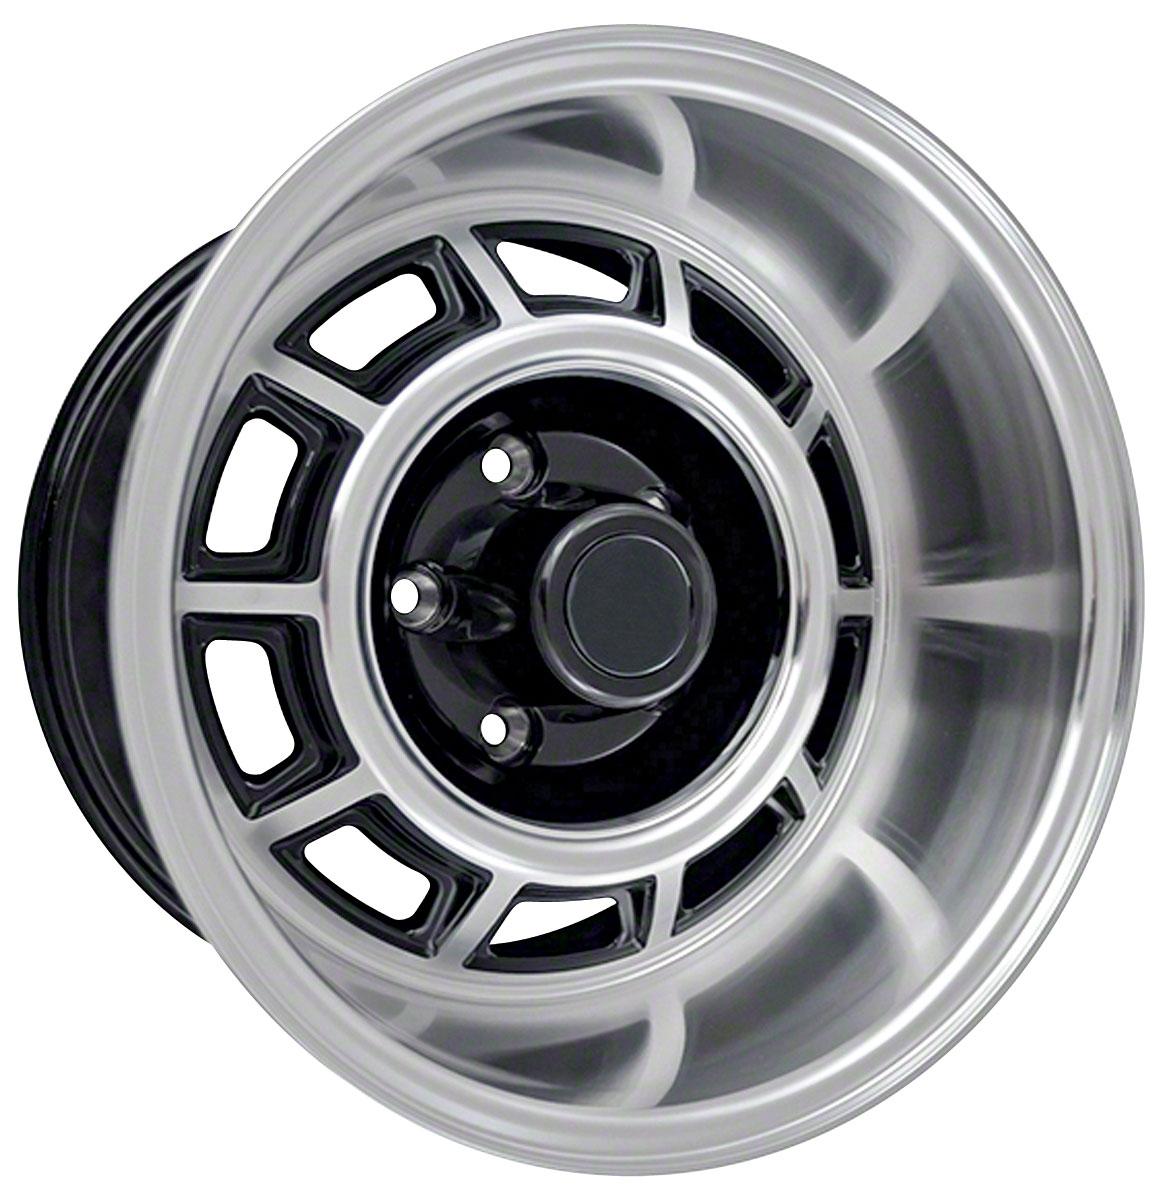 "Buick T Type >> Goodmark 1978-87 Wheels, Aluminum, Grand National 15"" X 8"" (B.S. 4"") @ OPGI.com"